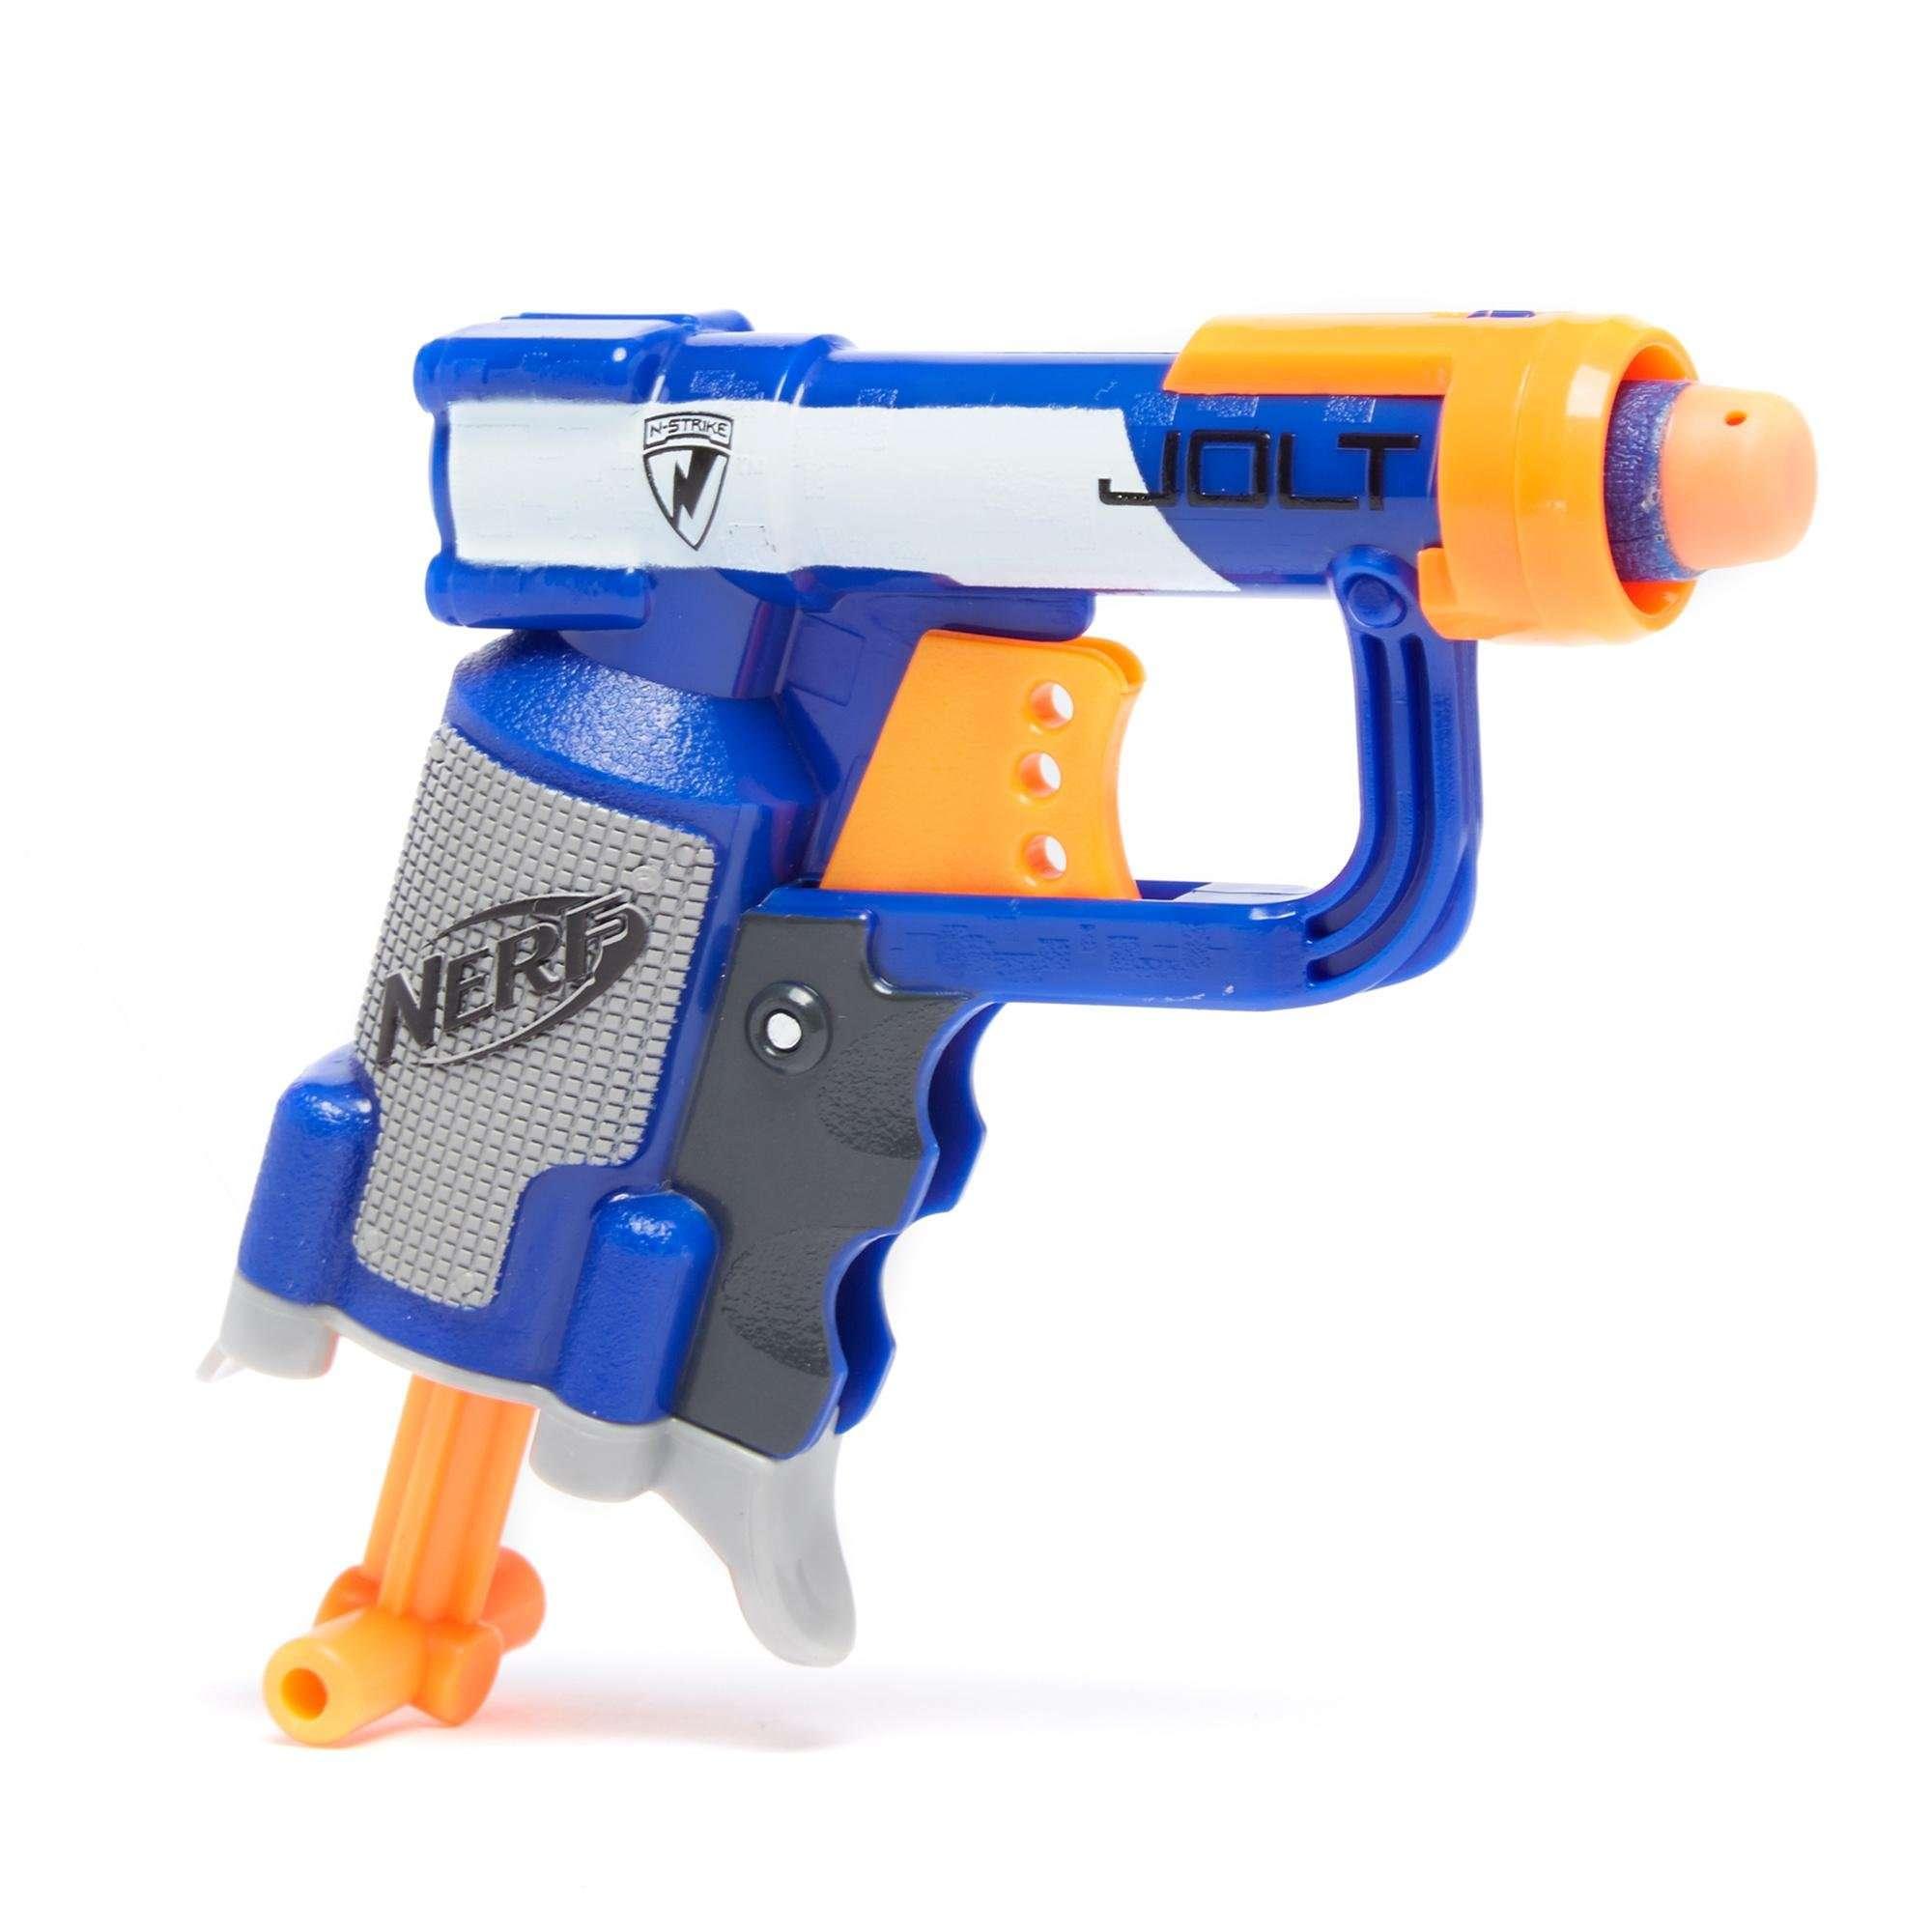 NERF Nerf Elite Jolt Blaster